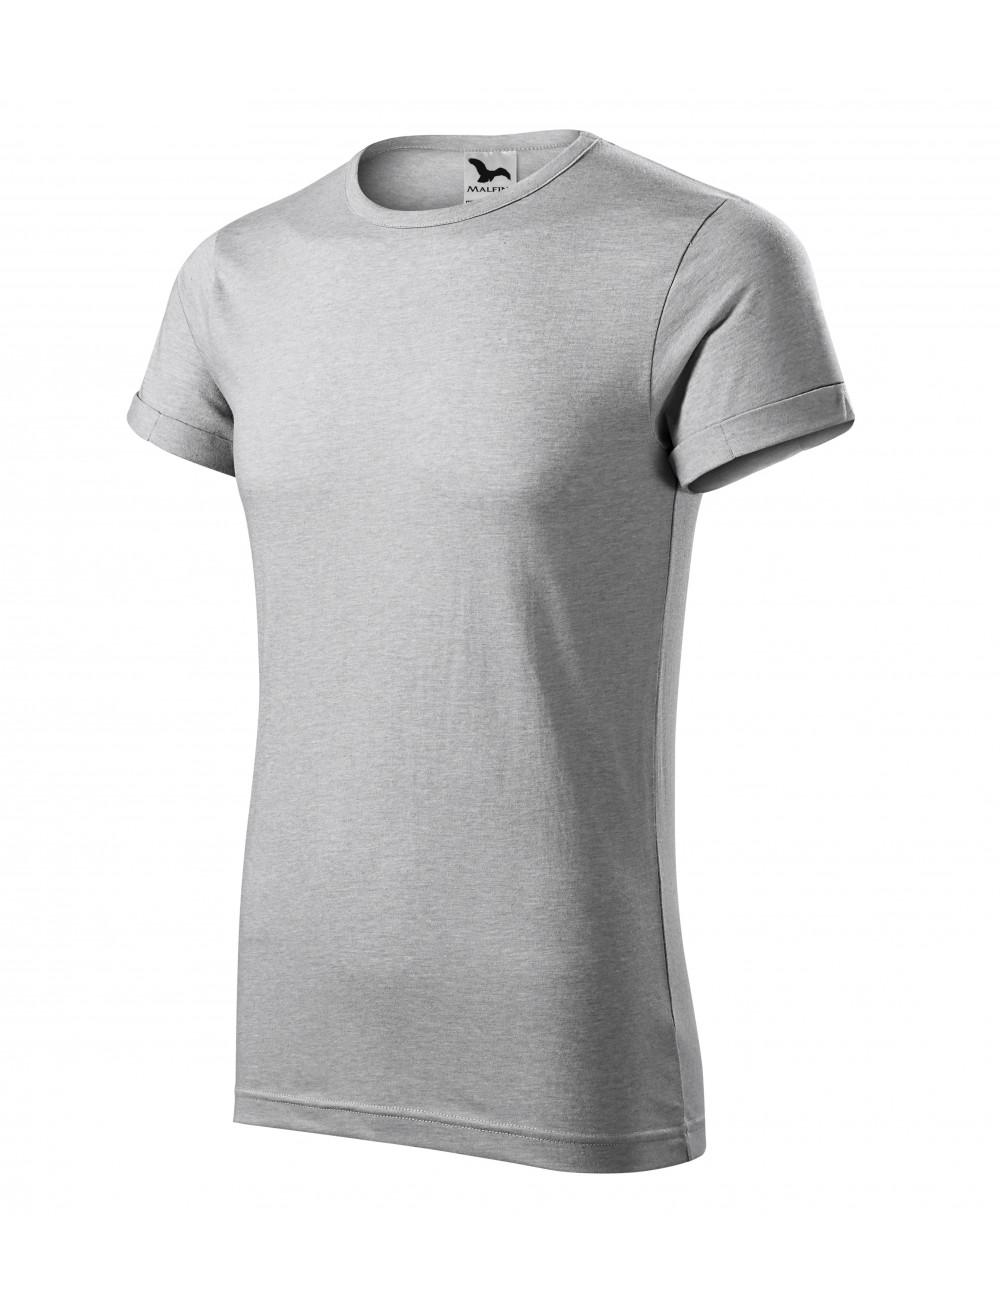 Adler MALFINI Koszulka męska Fusion 163 srebrny melanż